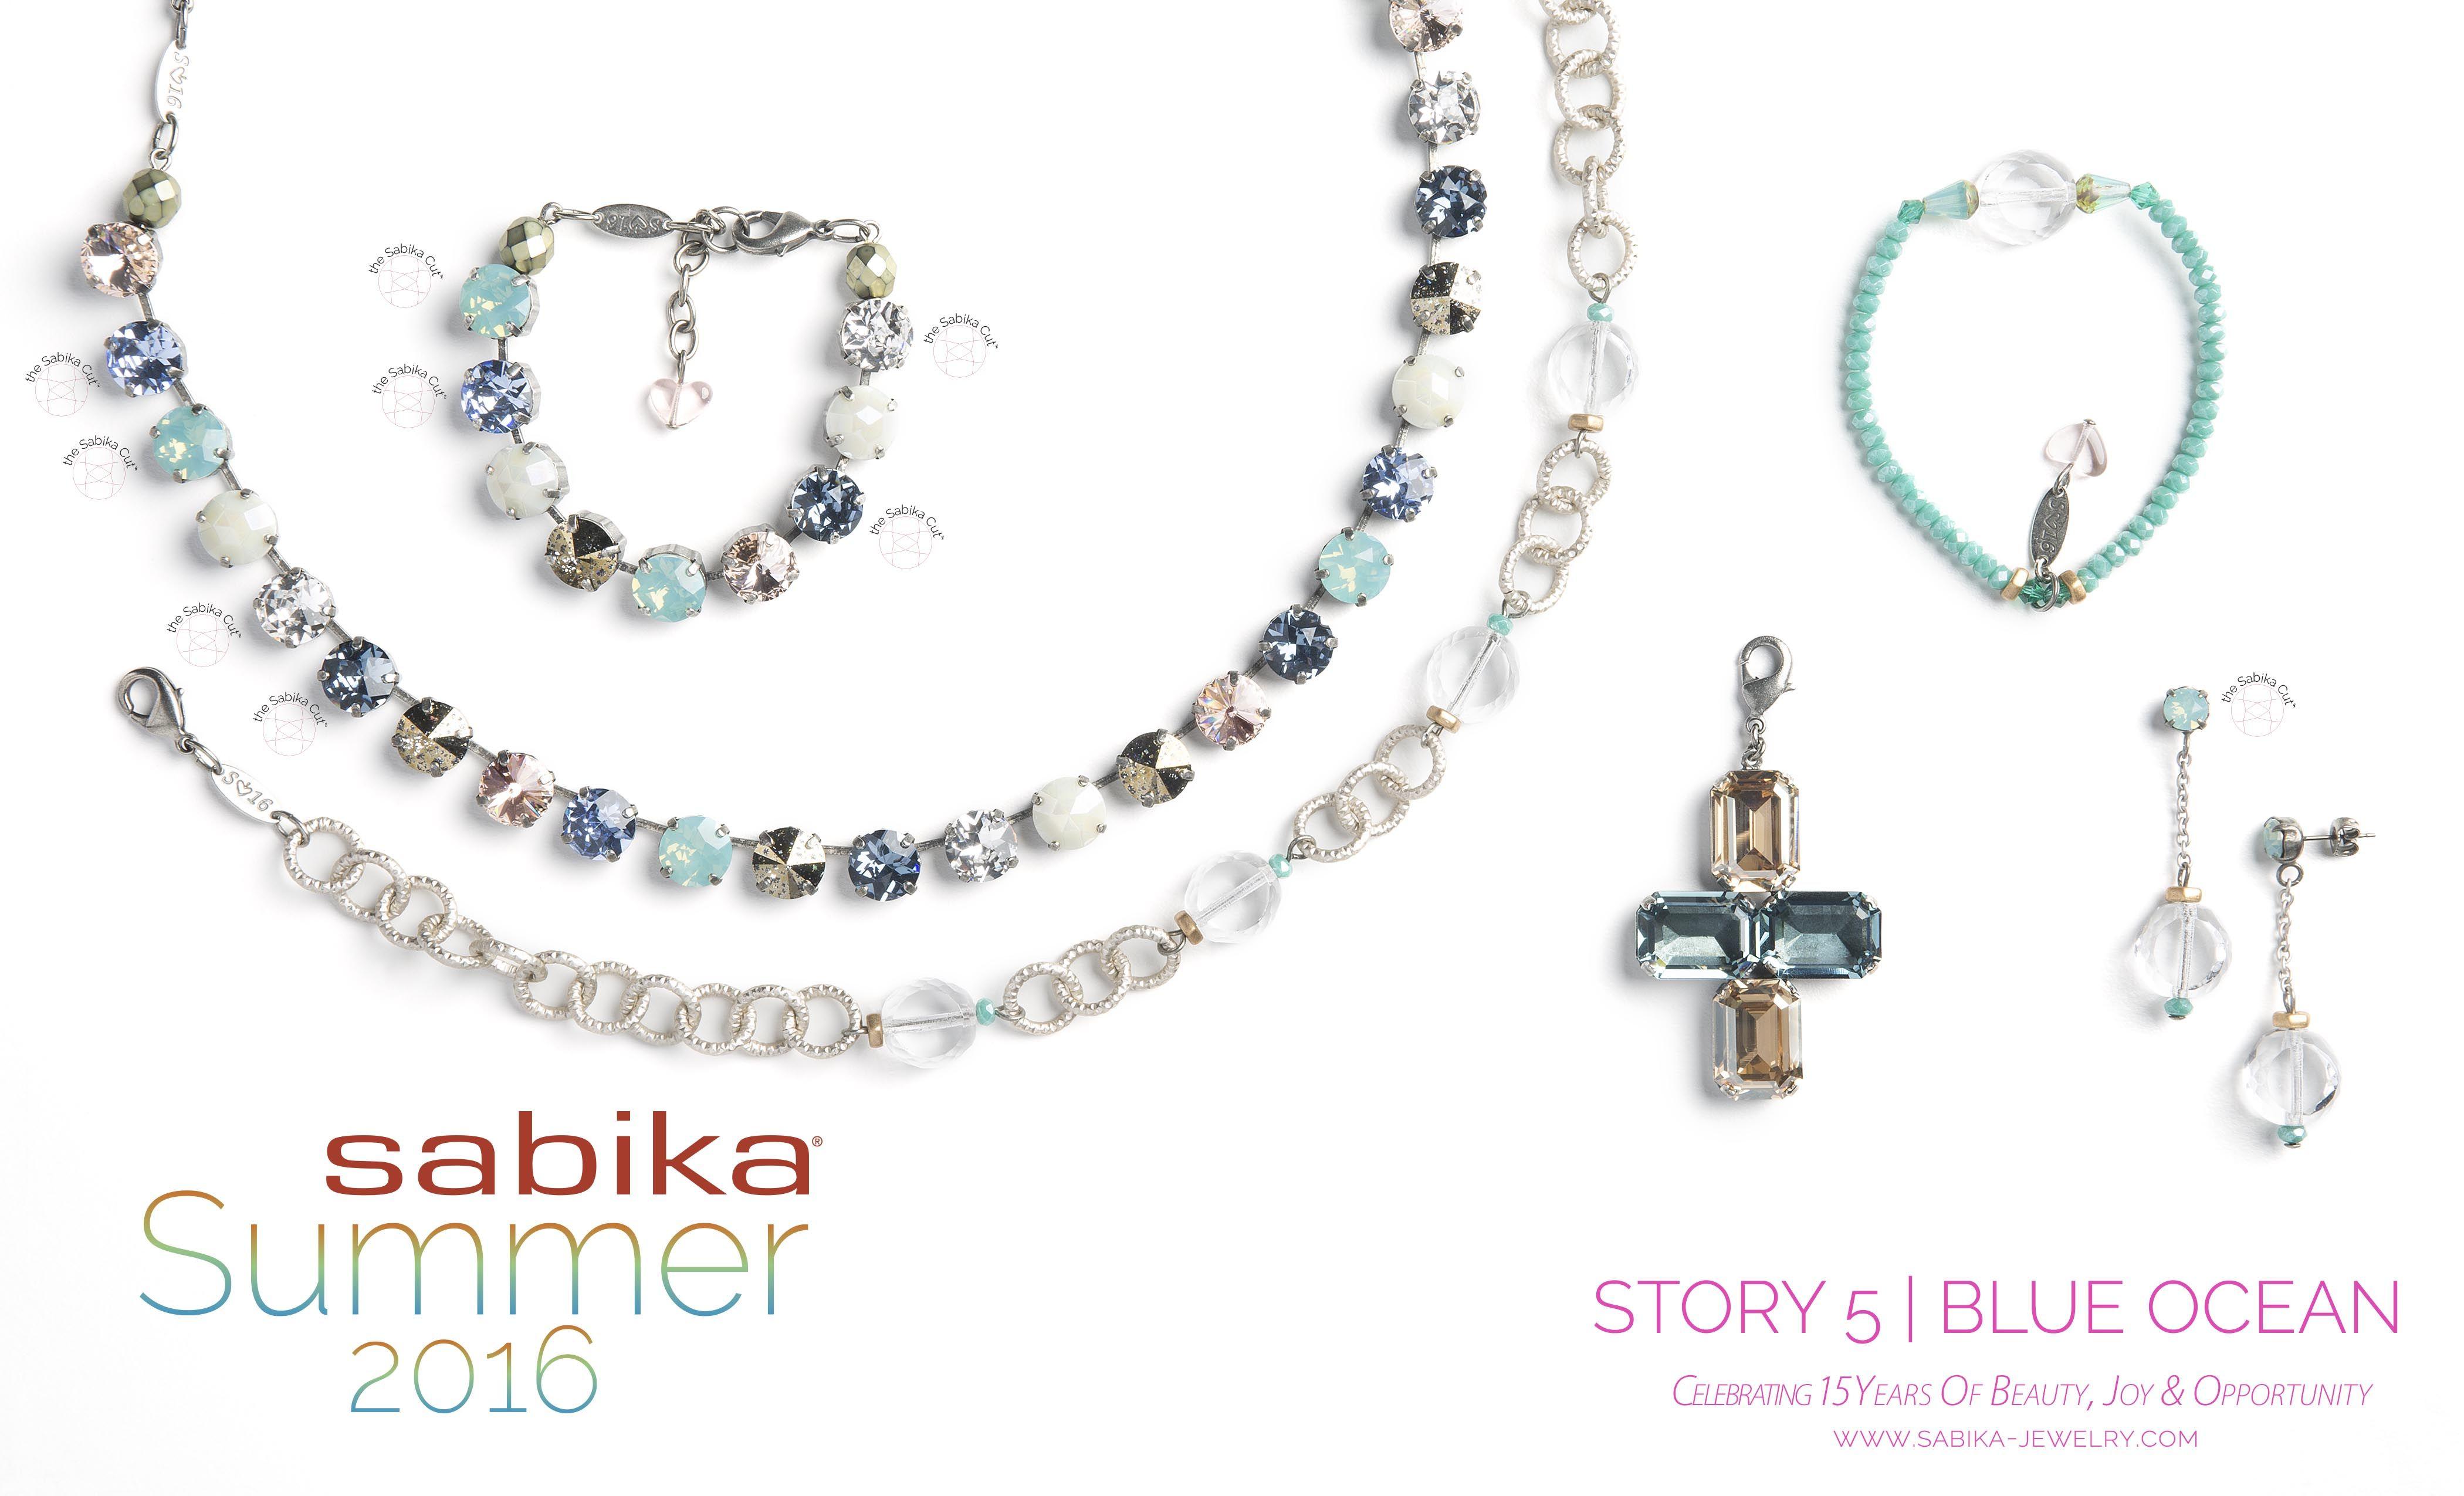 Sabika look necklace - Story 5 Blue Ocean